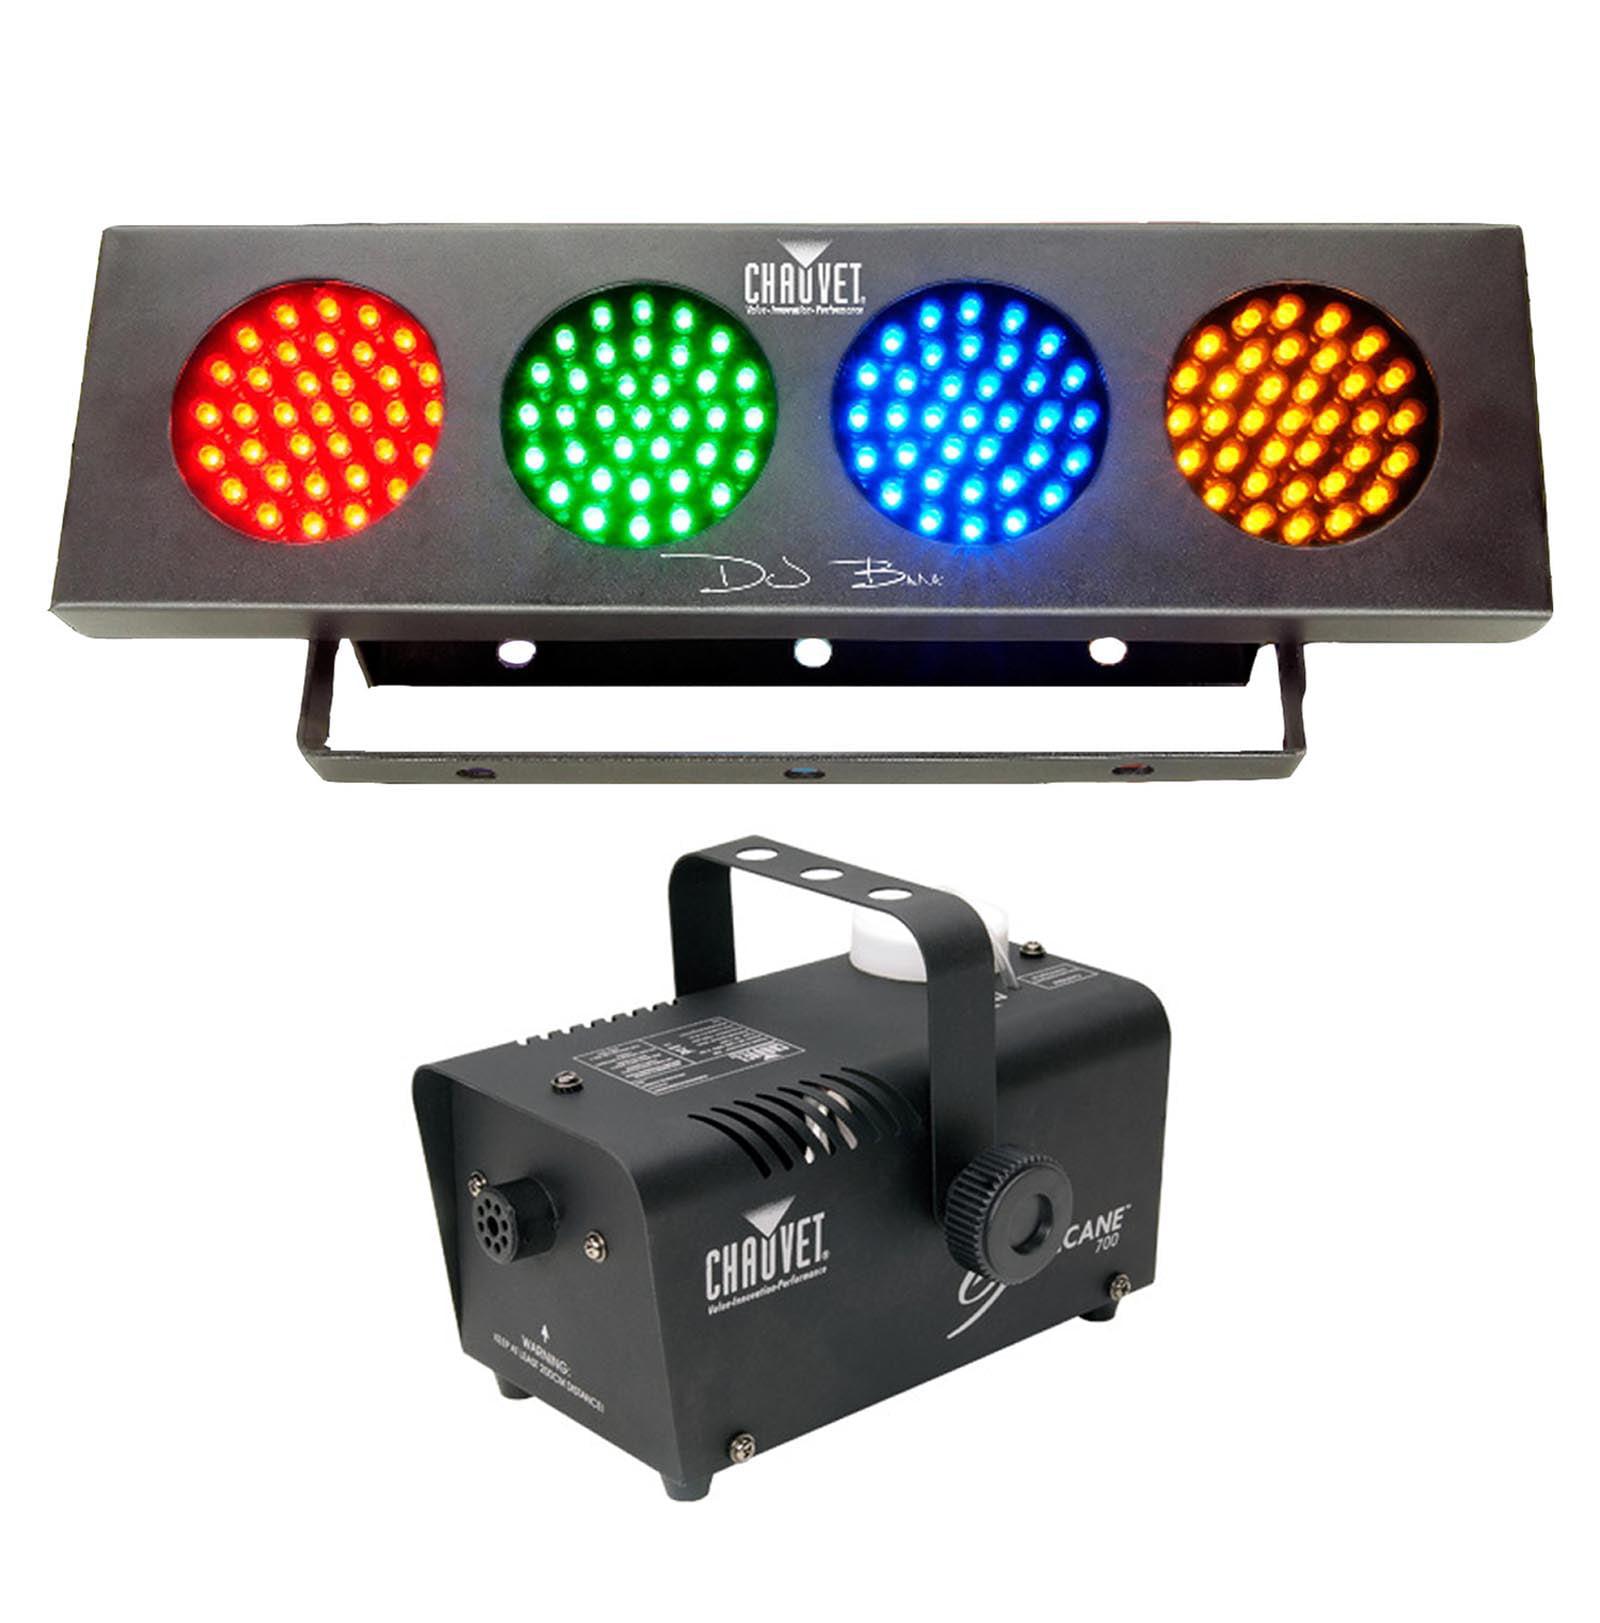 NEW! CHAUVET HURRICANE 700 H-700 Fog/Smoke Machine + DJ BANK LED RGBA Wash Light